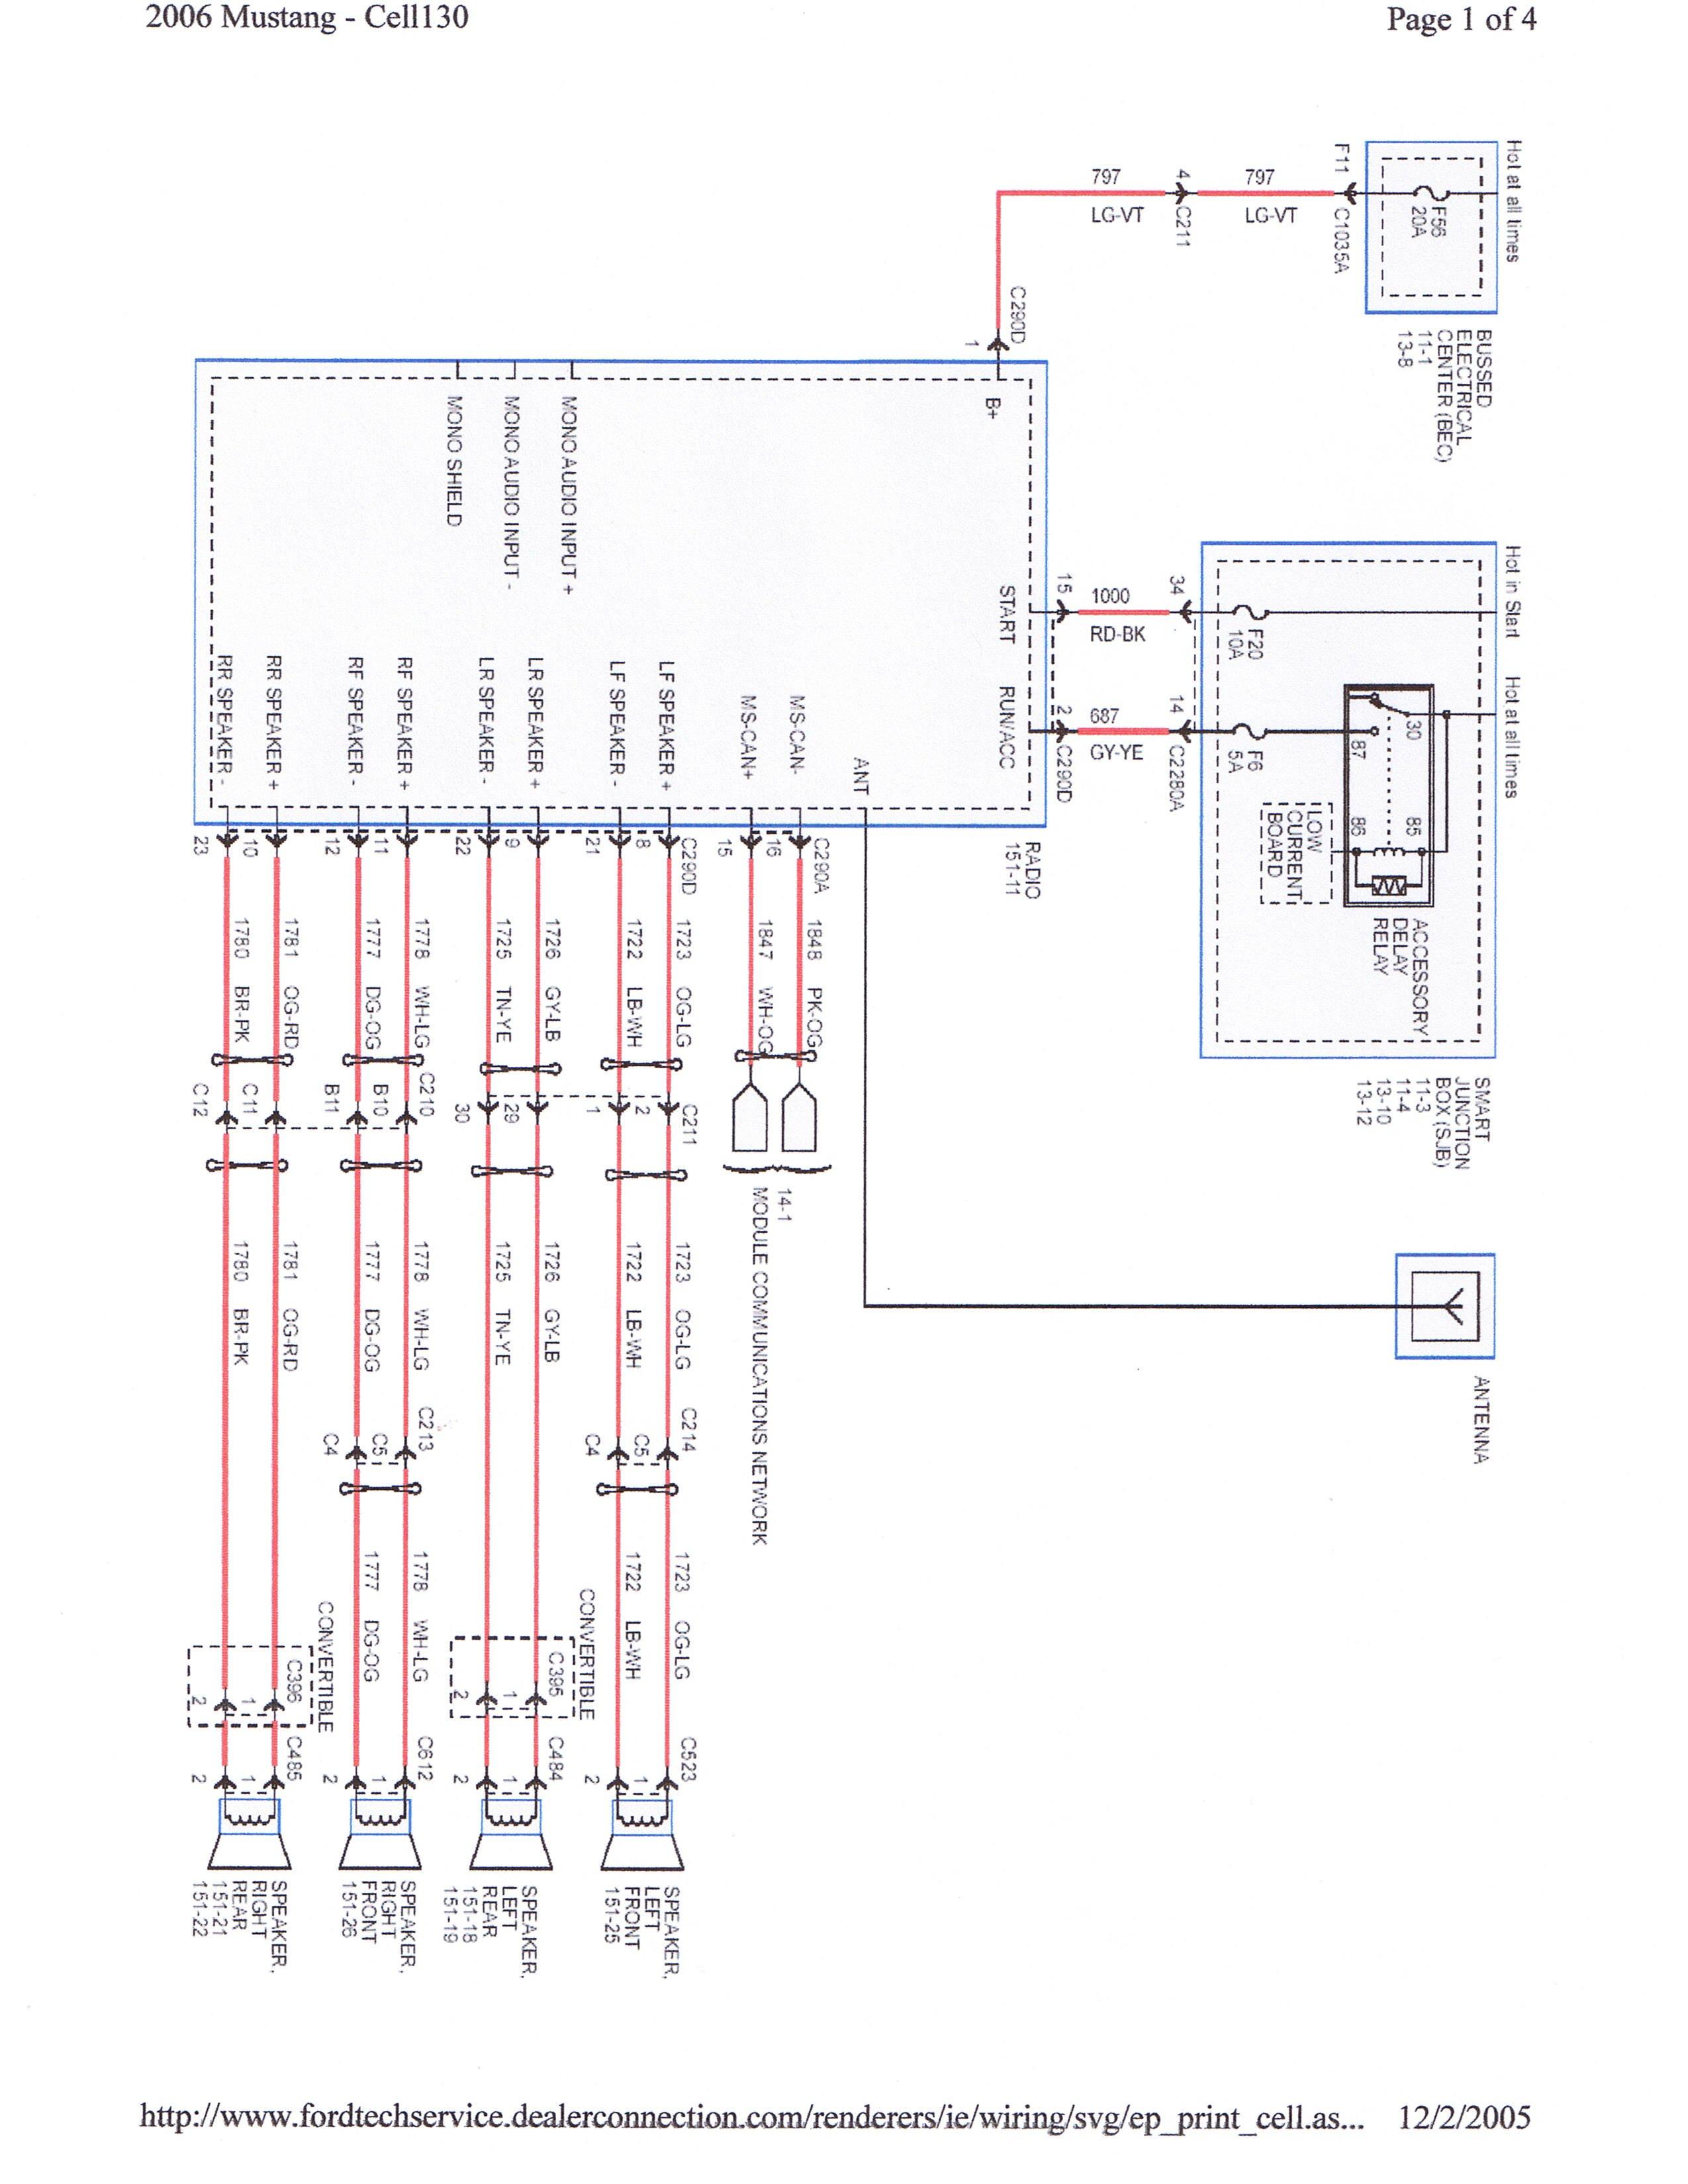 [DIAGRAM_3ER]  2004 Mustang Gt Wiring Diagram - Warn Winch Rocker Switch Wiring Diagram  for Wiring Diagram Schematics | Ford Gt Wiring Diagram |  | Wiring Diagram Schematics